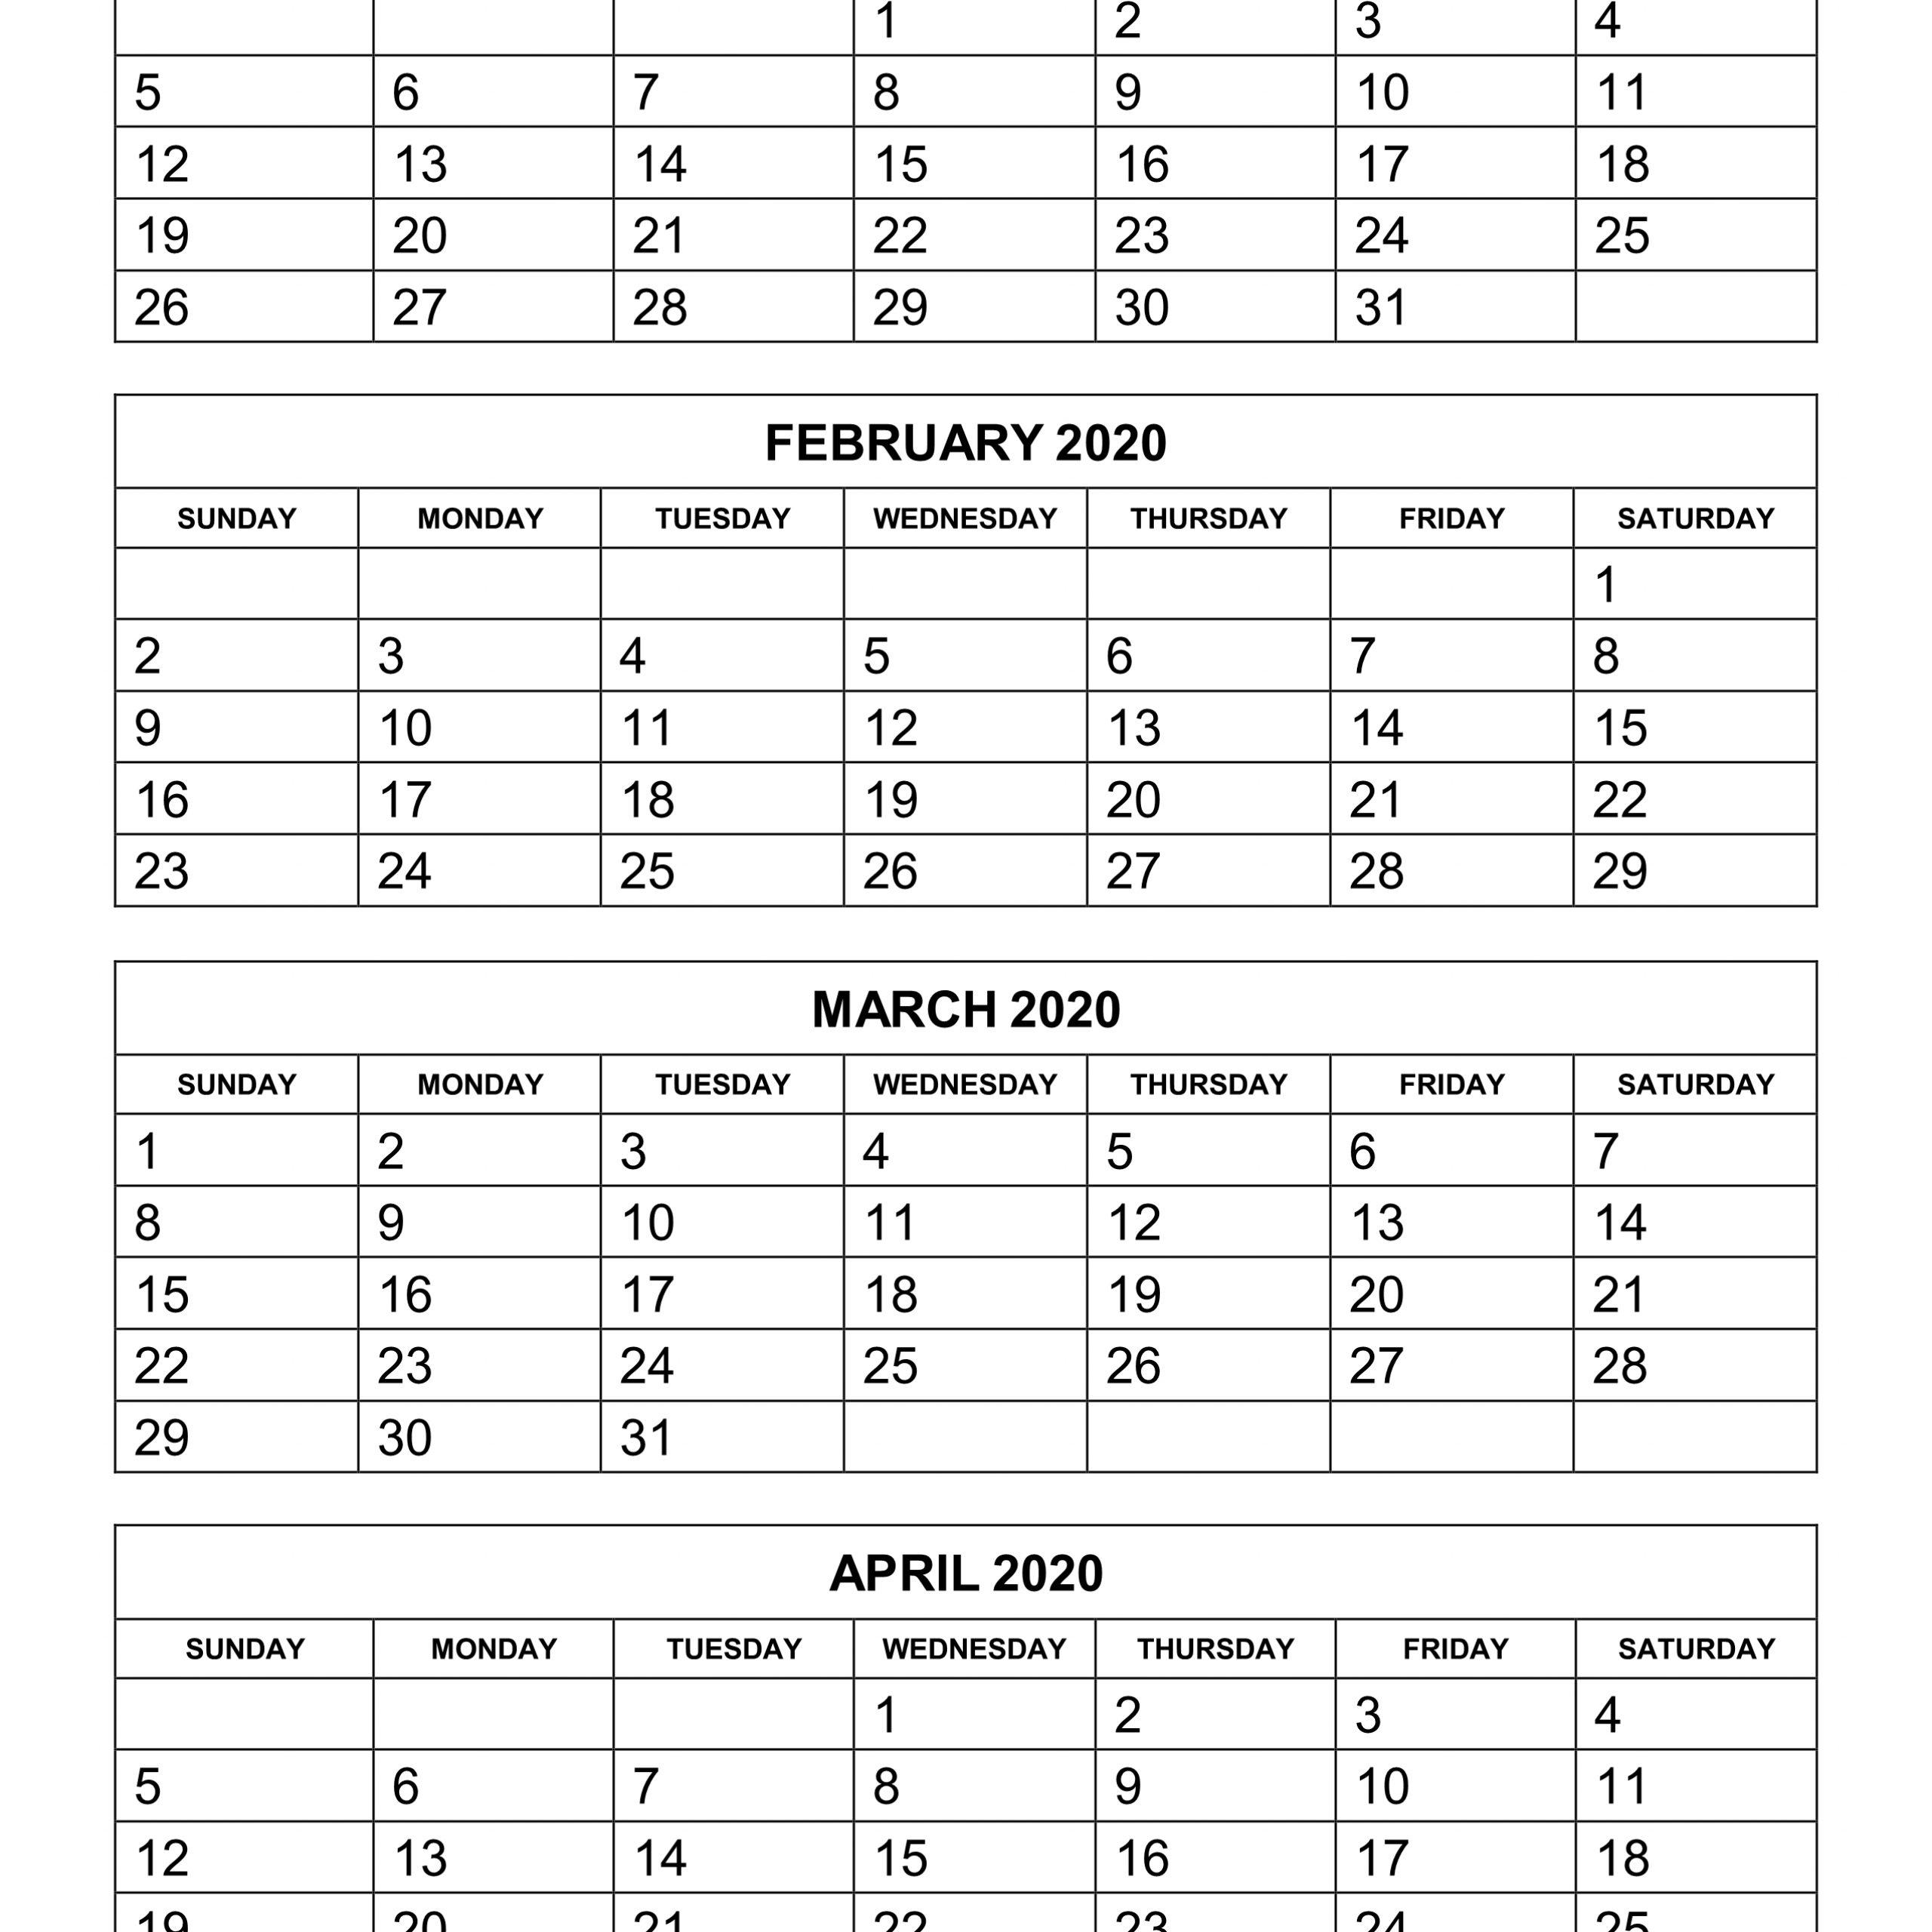 2020 Printable Calendar 3 Months Per Page | Free Printable regarding Printable Three Month Calendar